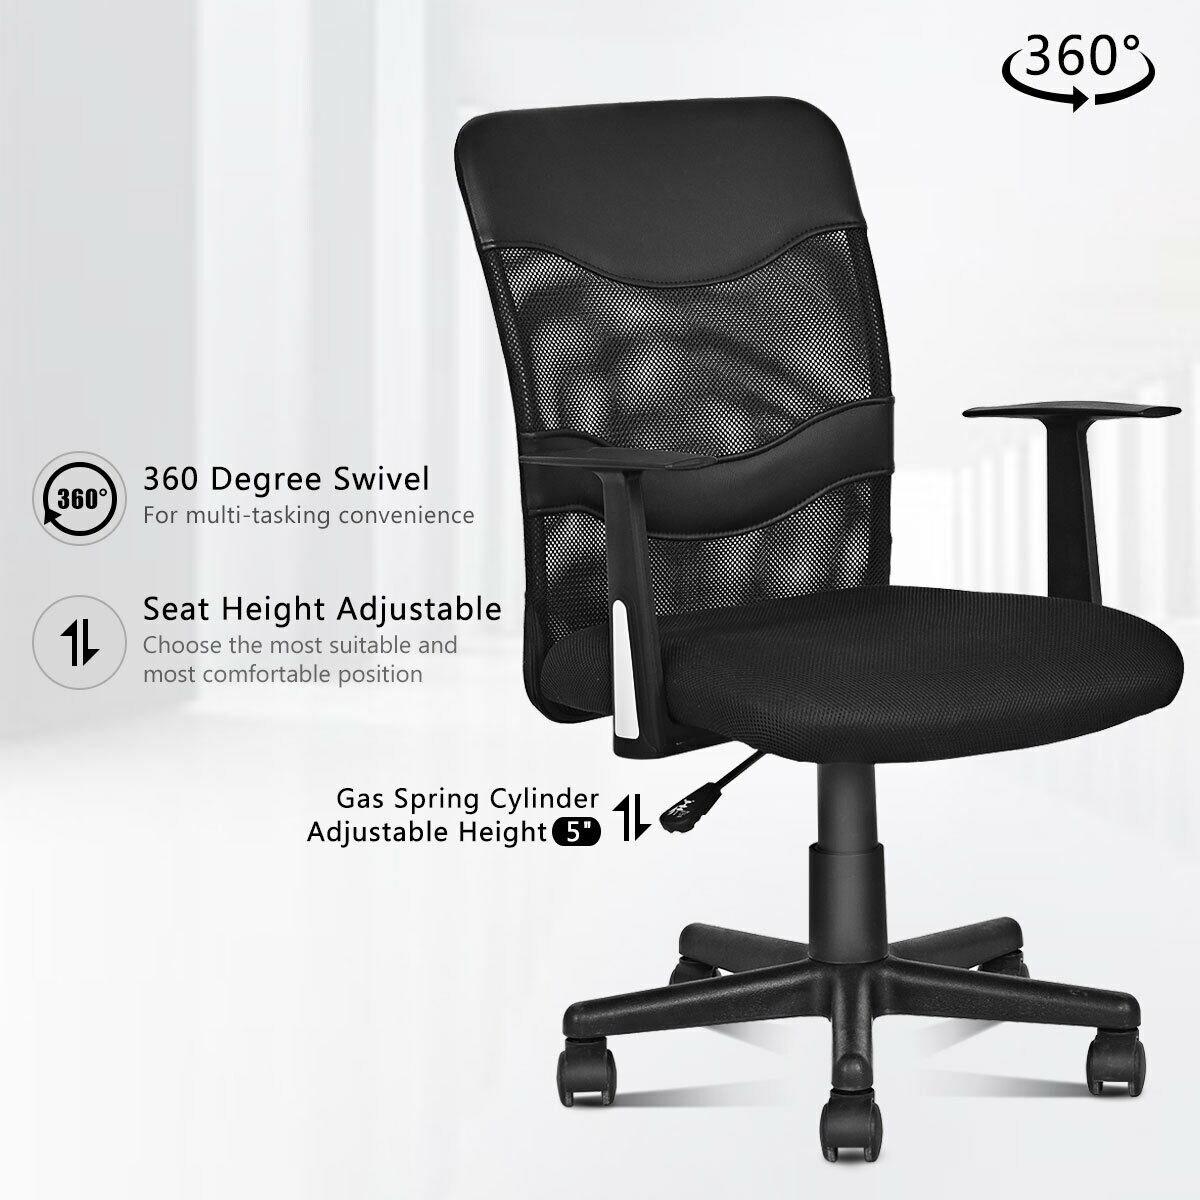 Office Furniture Ergonomic 360 Mesh Office Adjustable Chair High Back Computer Desks Seats Chair Business Office Industrial Limebuildinggroup Com Au